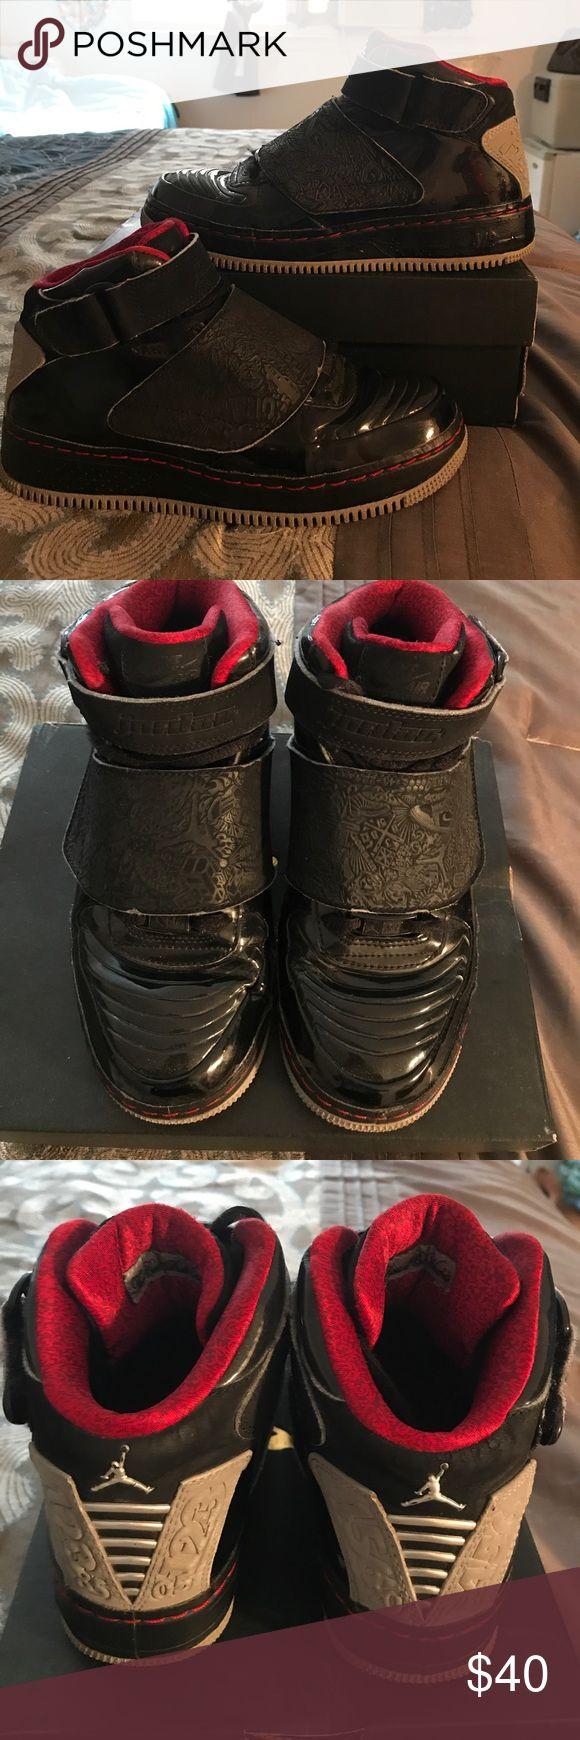 AJF 20 Best Of Both Worlds!! NIKE AIR JORDAN AJF AF1 20 Kids Youth GS 331951-001 Size 4.5 NO BOX!! Jordan Shoes Sneakers